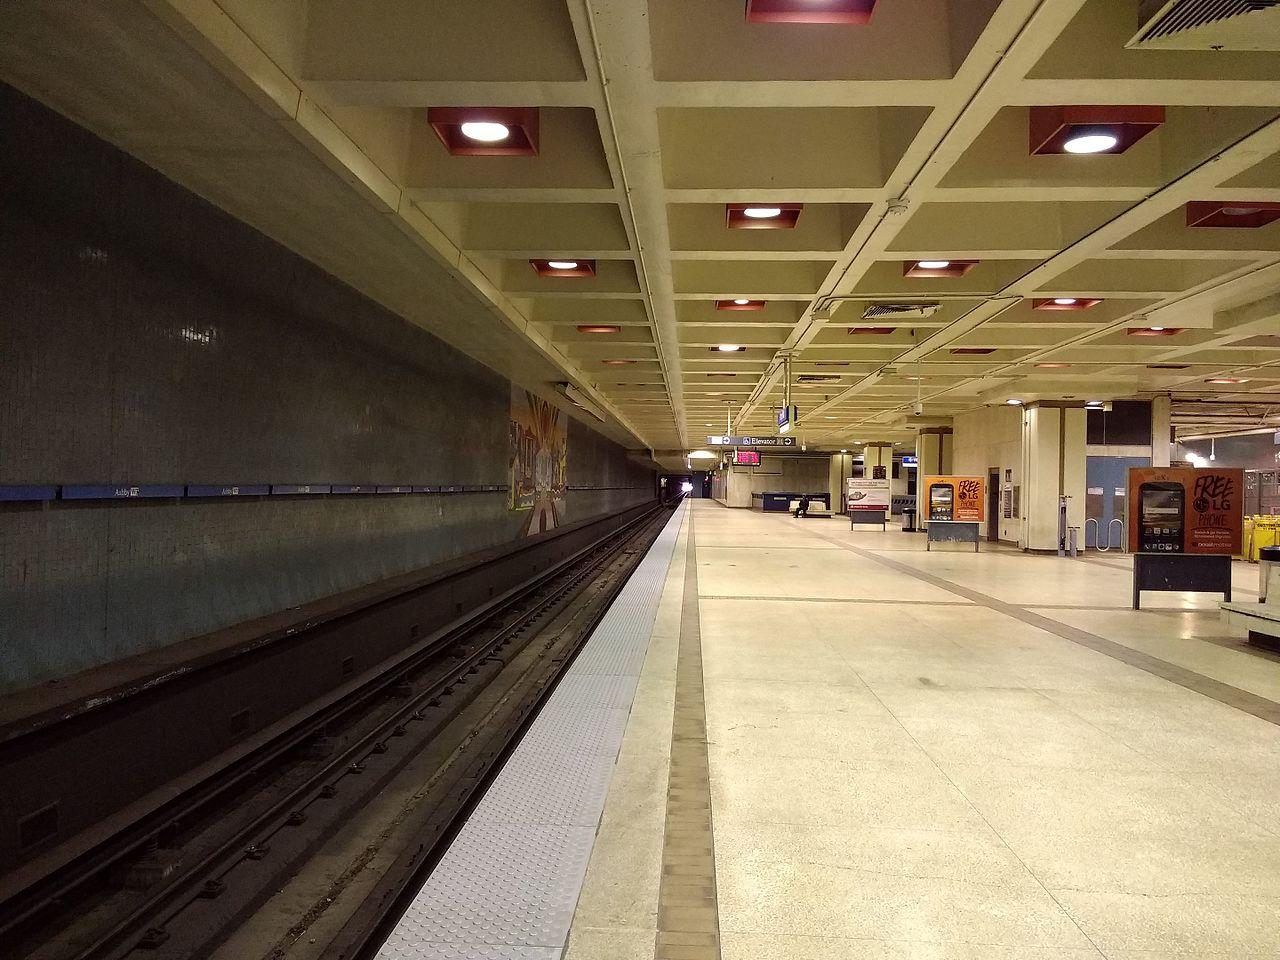 Ashby station